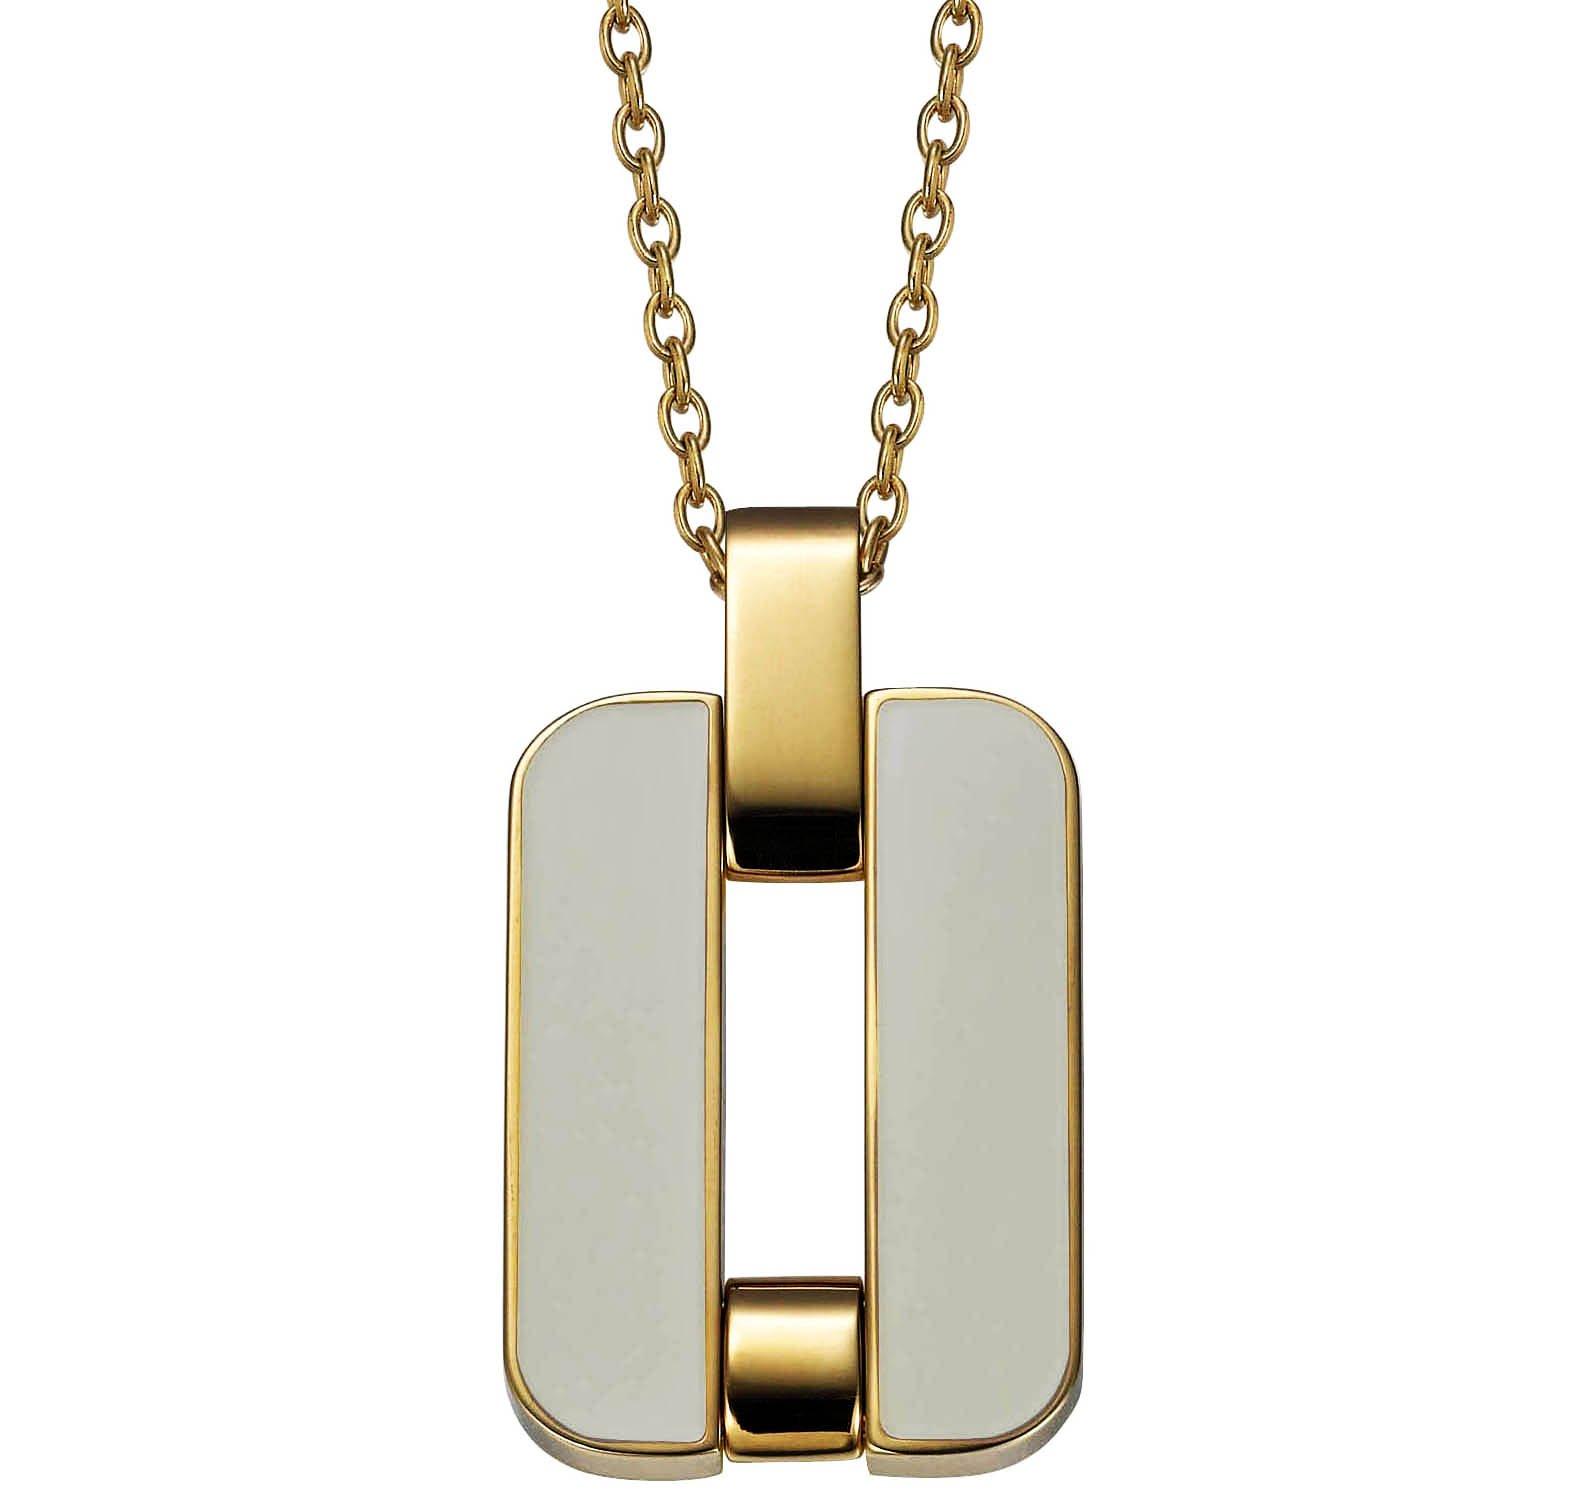 Joop! Jewelry Pristine JPNL10563B420 womans necklace Epoxy inlay